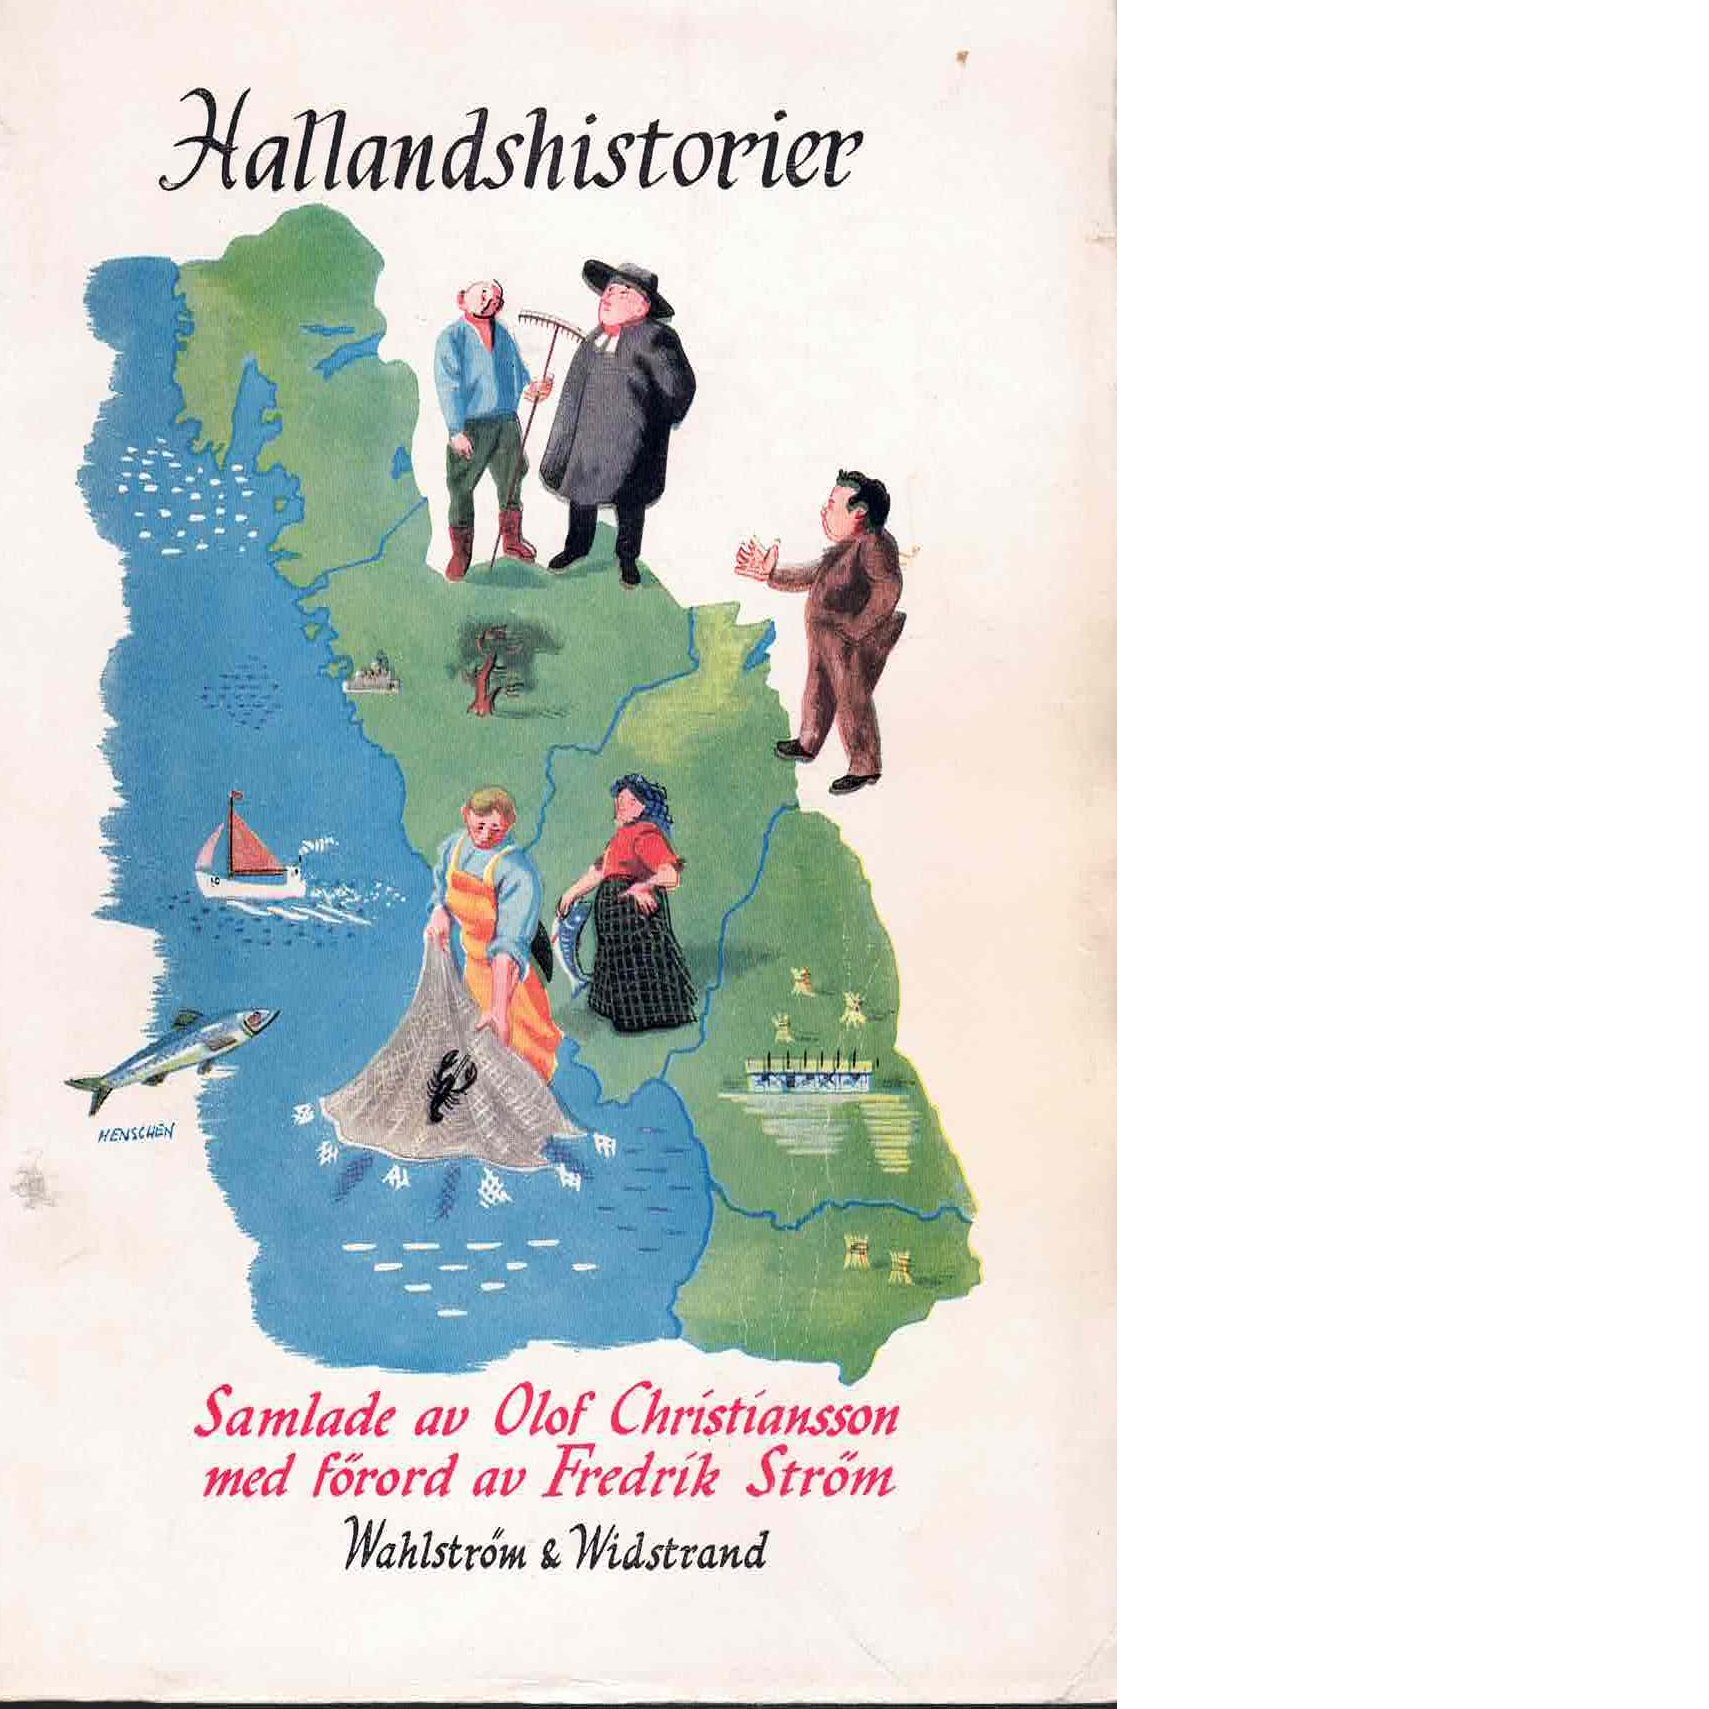 Hallandshistorier - Red.